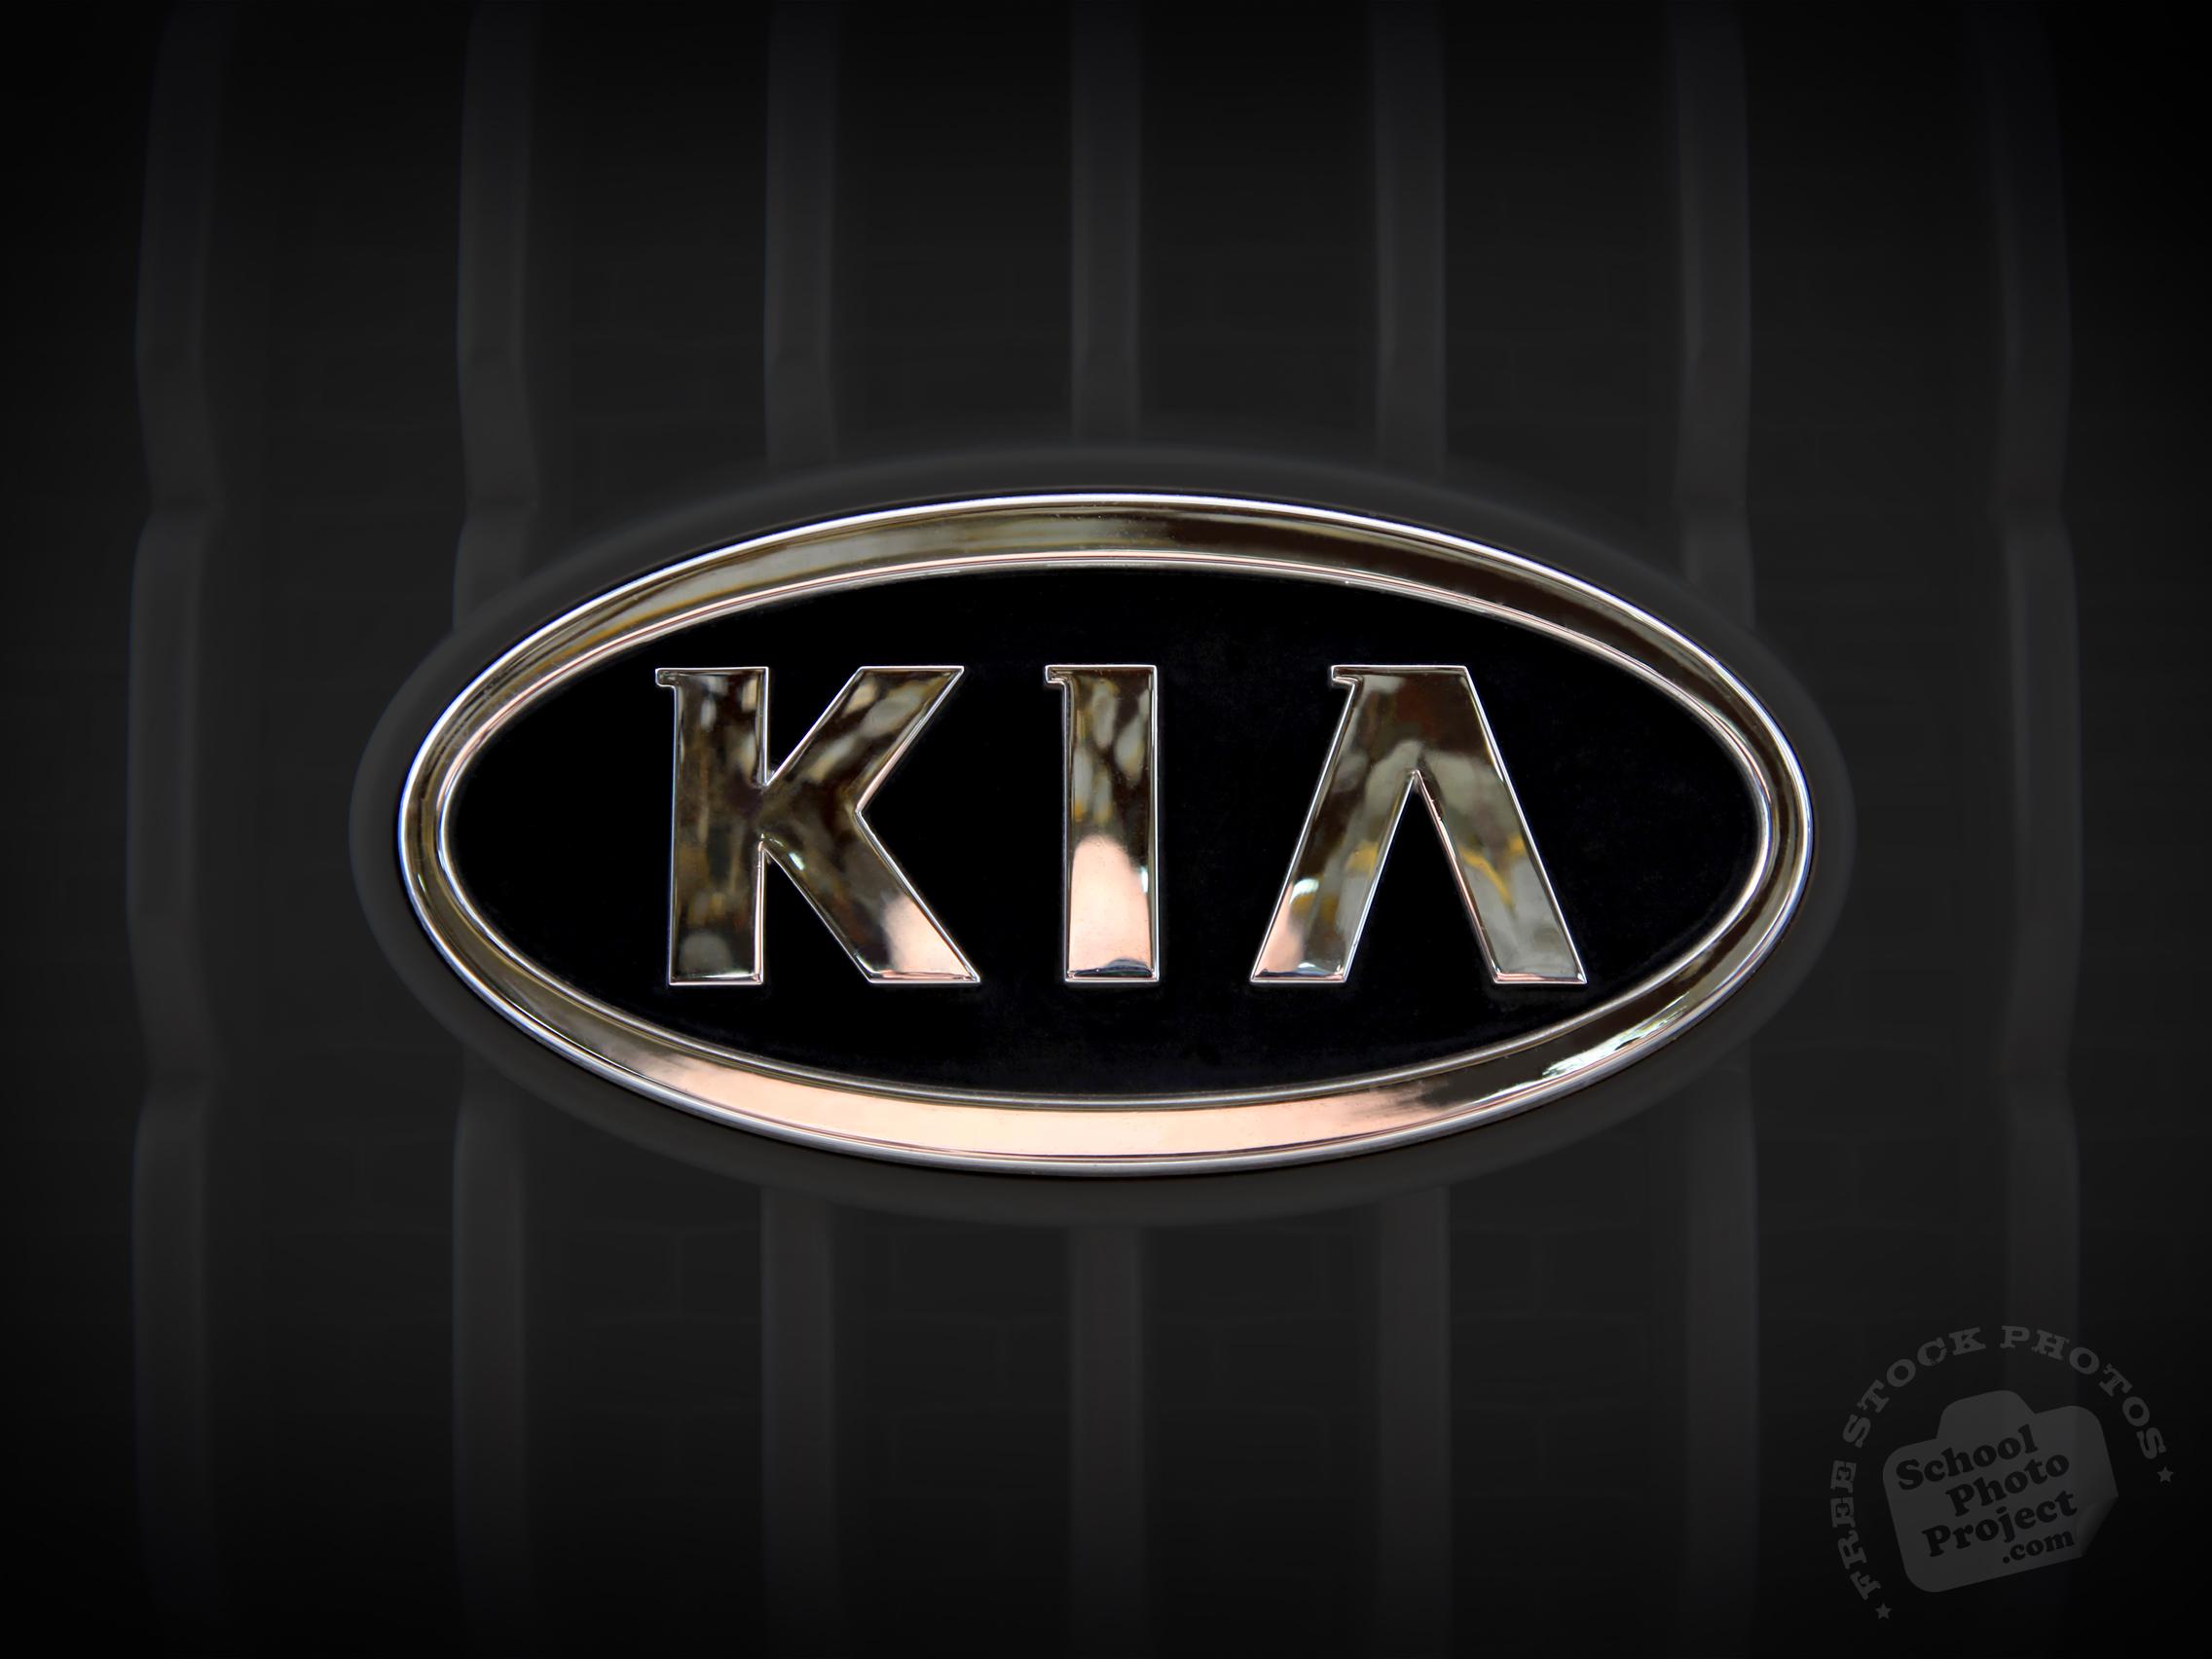 Free kia logo kia car brand famous car identity royalty free kia kia car logo brand mark car automobile identity biocorpaavc Image collections